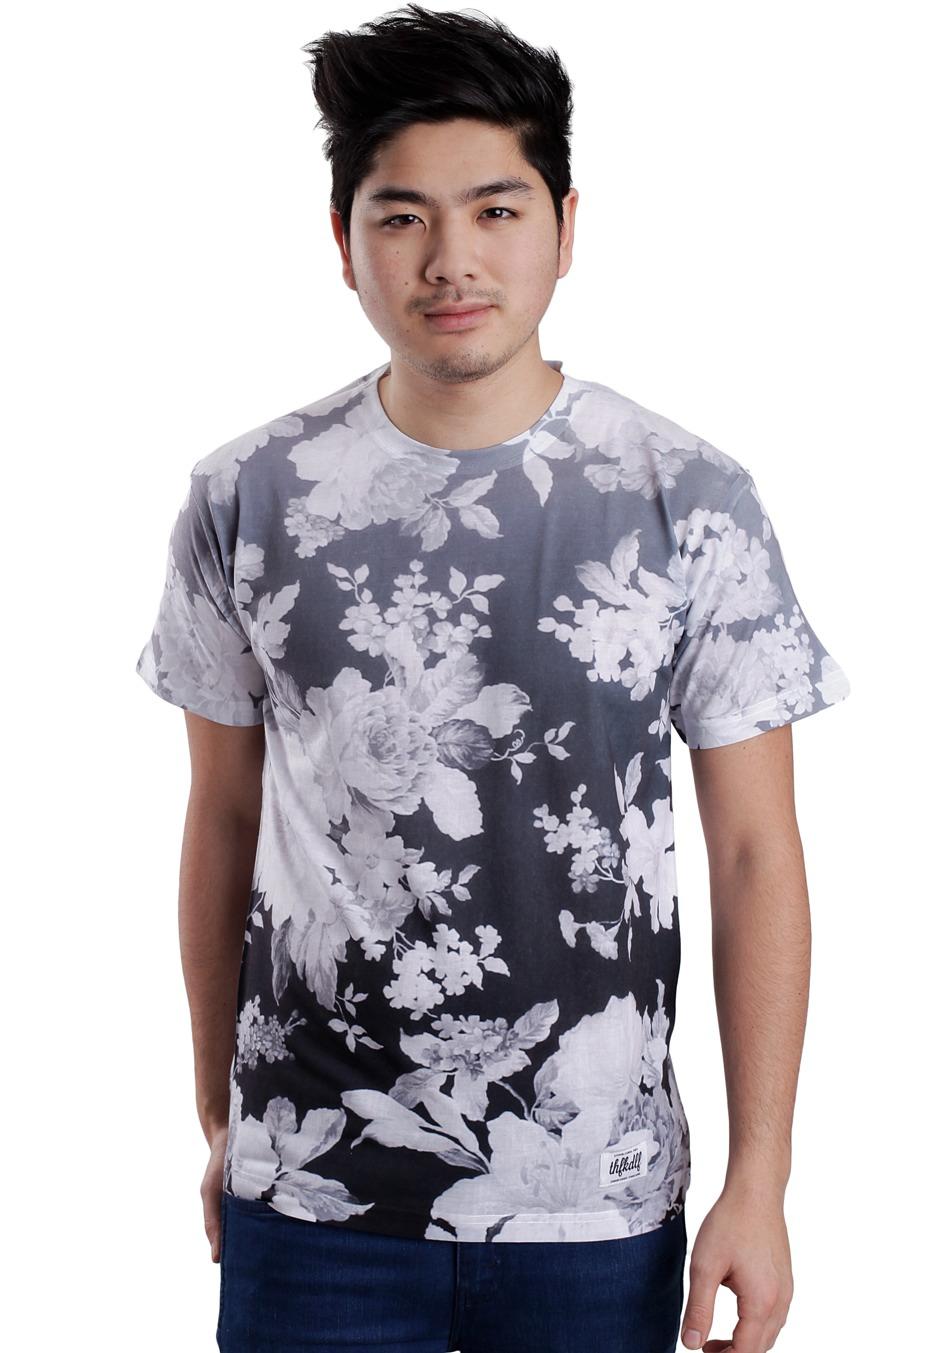 THFKDLF - Black & White Floral - T-Shirt - Streetwear boutique en ligne - Impericon France